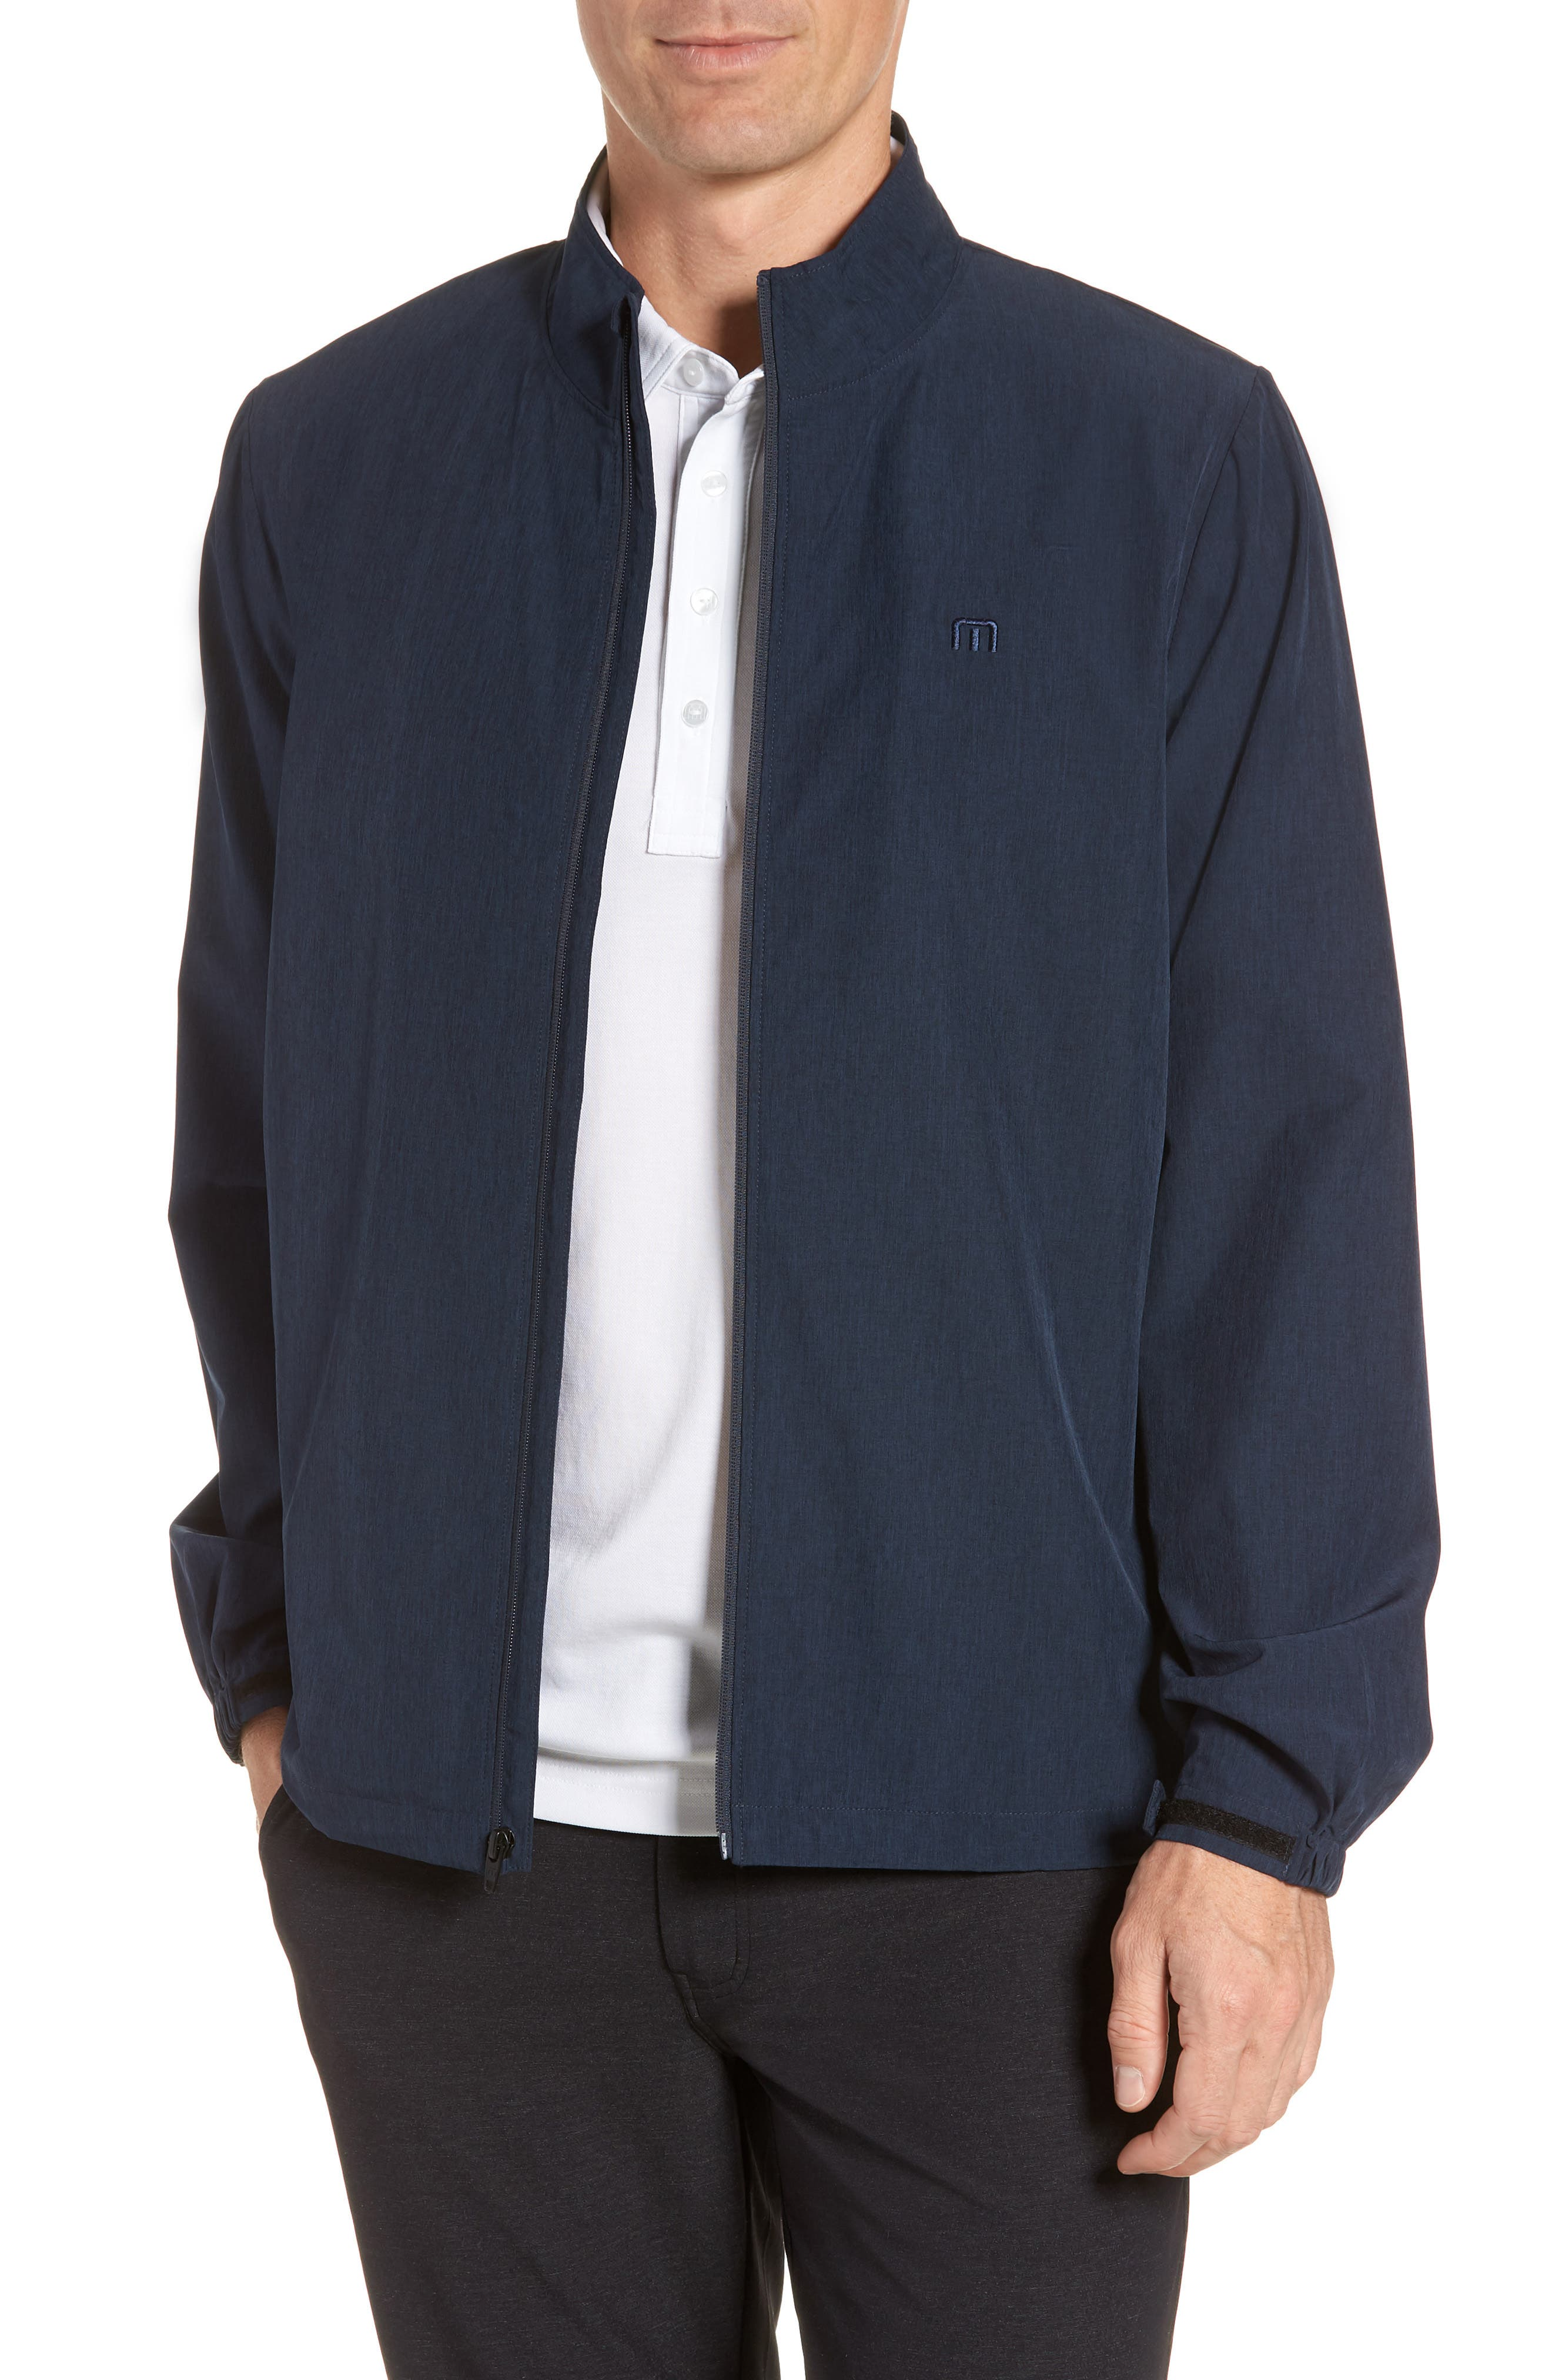 Road Soda Jacket,                         Main,                         color, HEATHER BLUE NIGHTS